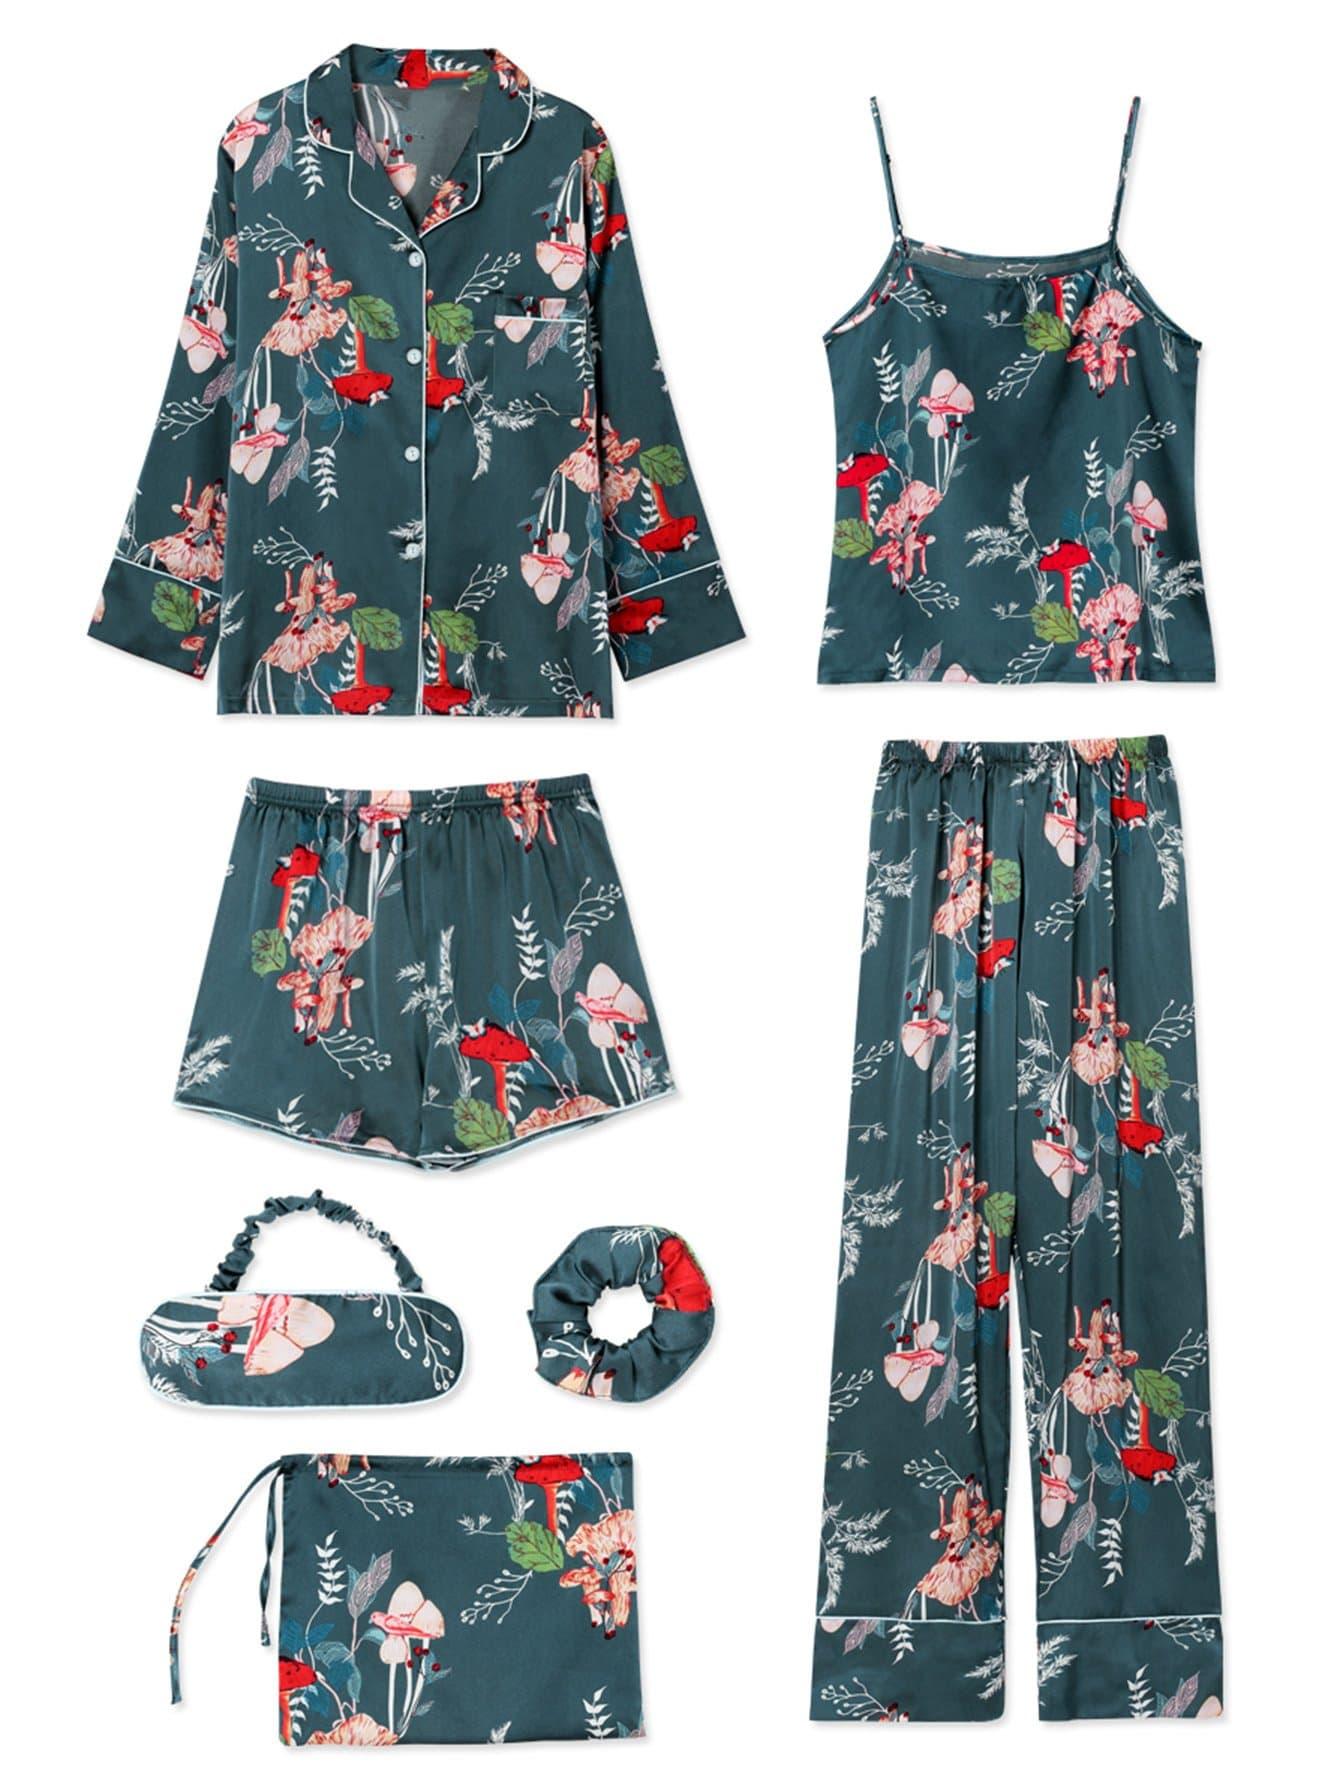 7pcs Cami Pajama Set mit Blumenmuster und Bluse